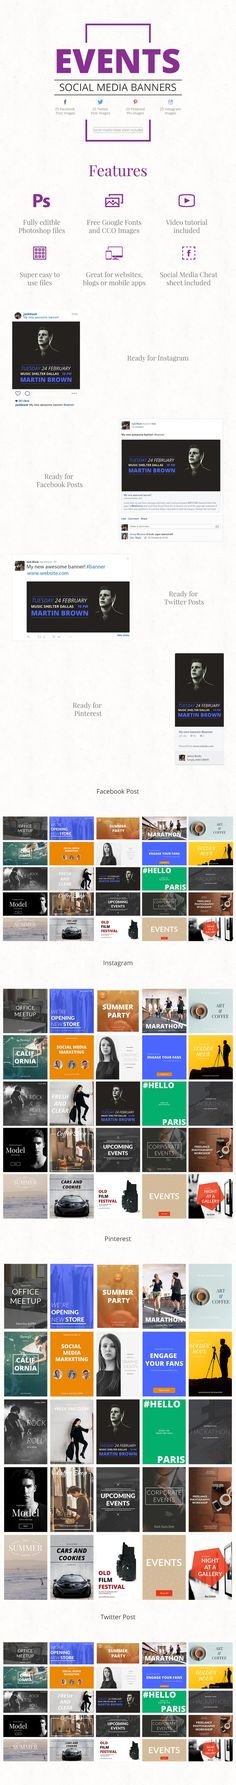 Events Social Media Banners #events #blog #banner #banners #bloggraphics #socialmediatemplate #blogtemplate #socialmedia #websitegraphic #socialmediagraphic #facebook #twitter #instagram #pinterest #blogbanner #websitebanner #blogdesign